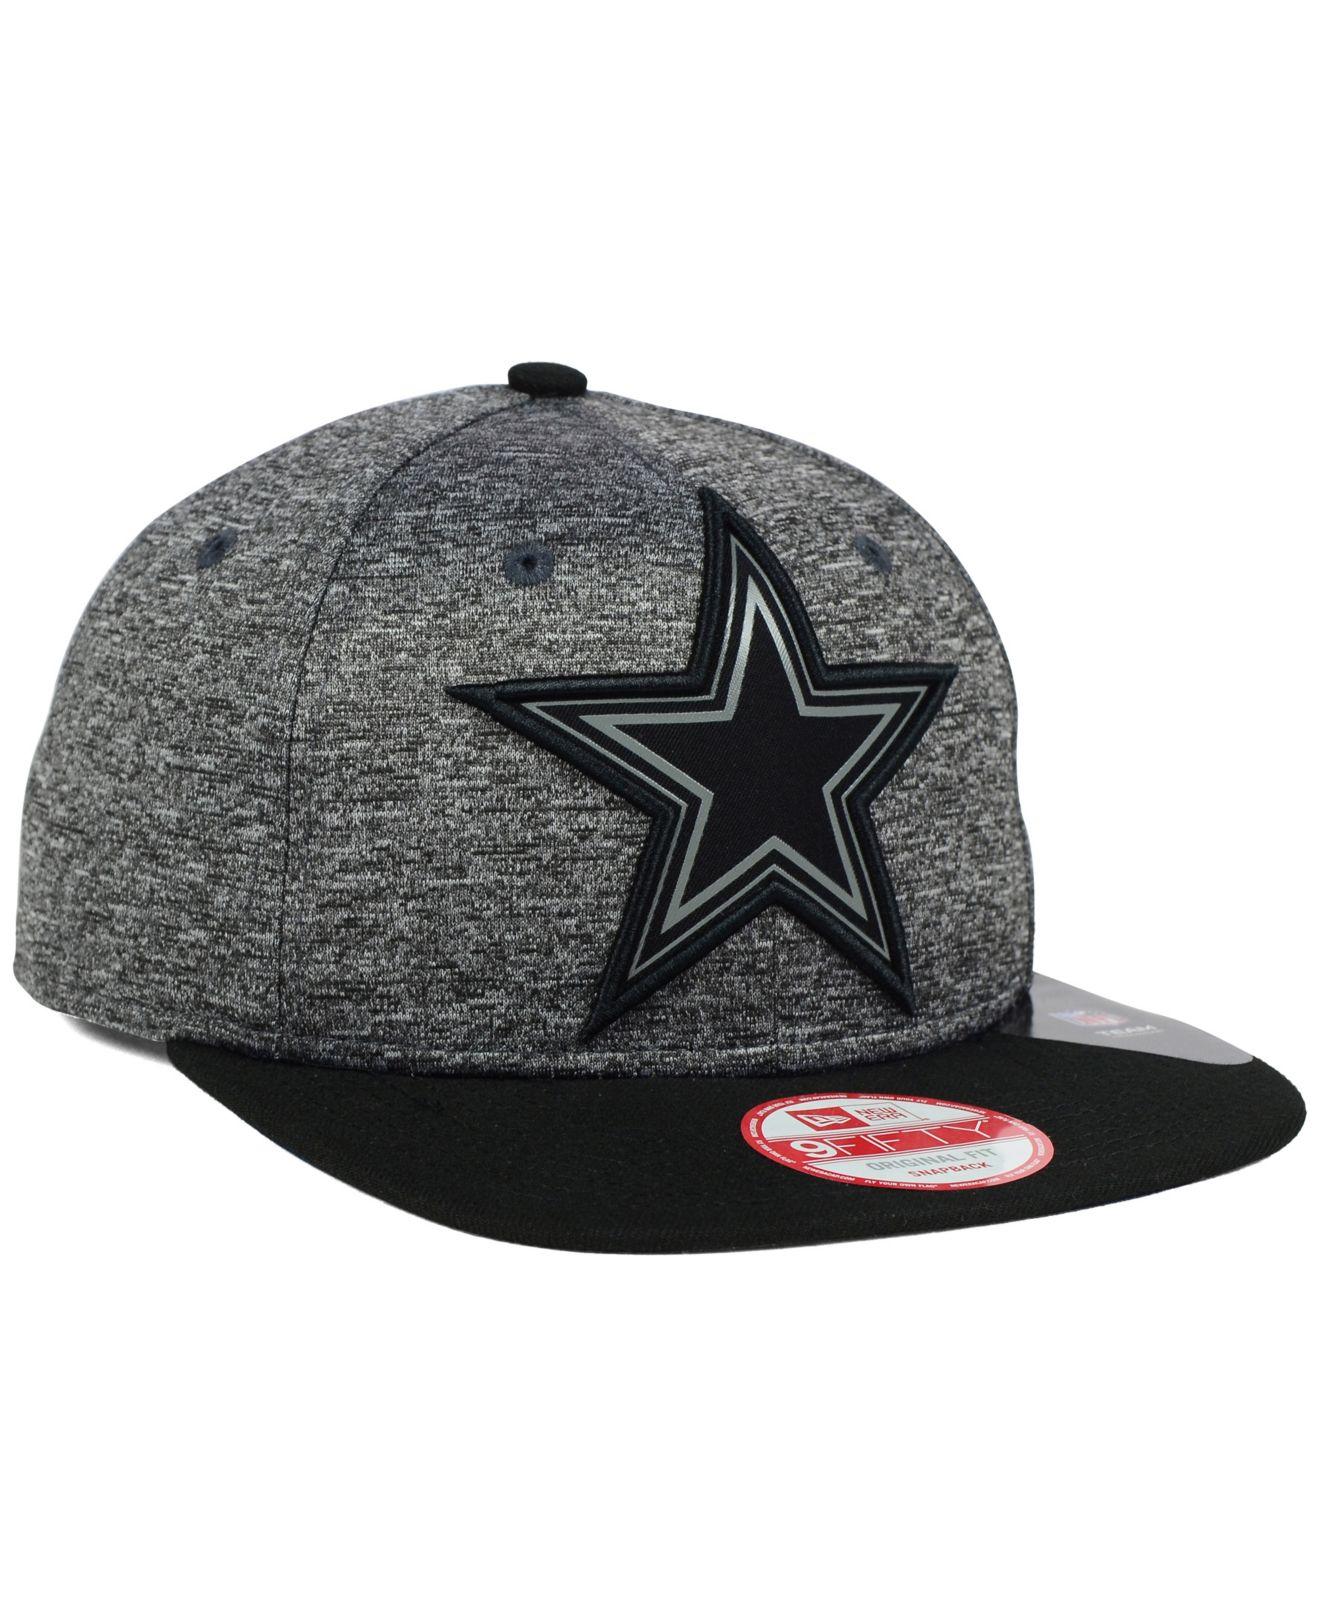 Lyst - KTZ Dallas Cowboys Gridiron 9fifty Snapback Cap in Black for Men 103cd4f67